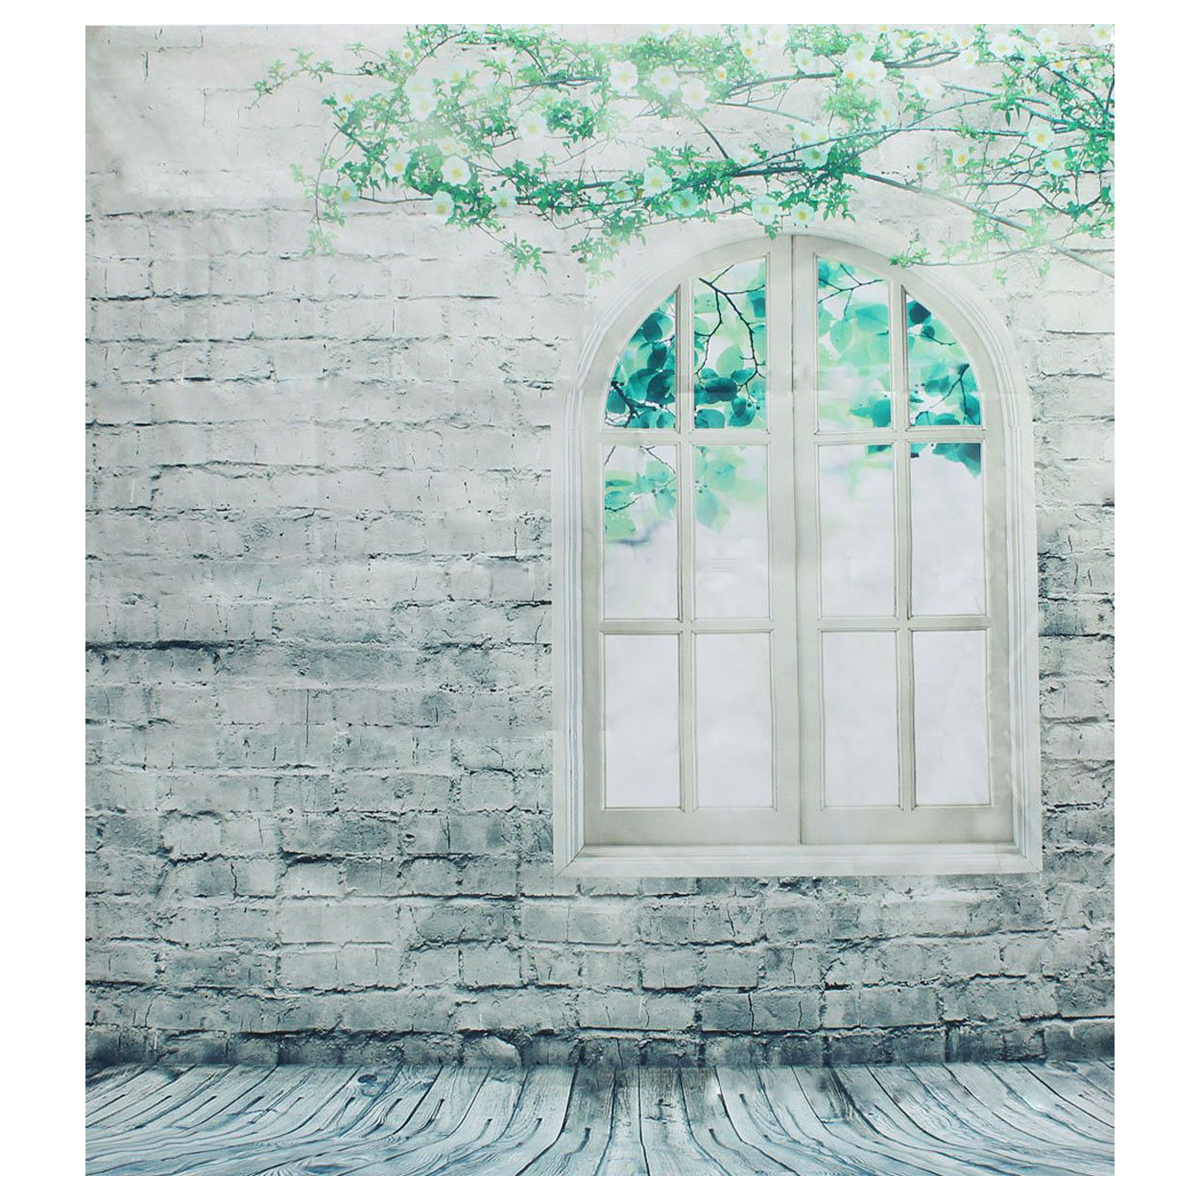 ETC 2*1.5m Window Tree Brick Wall Studio Photography Prop Backdrops Photo Background